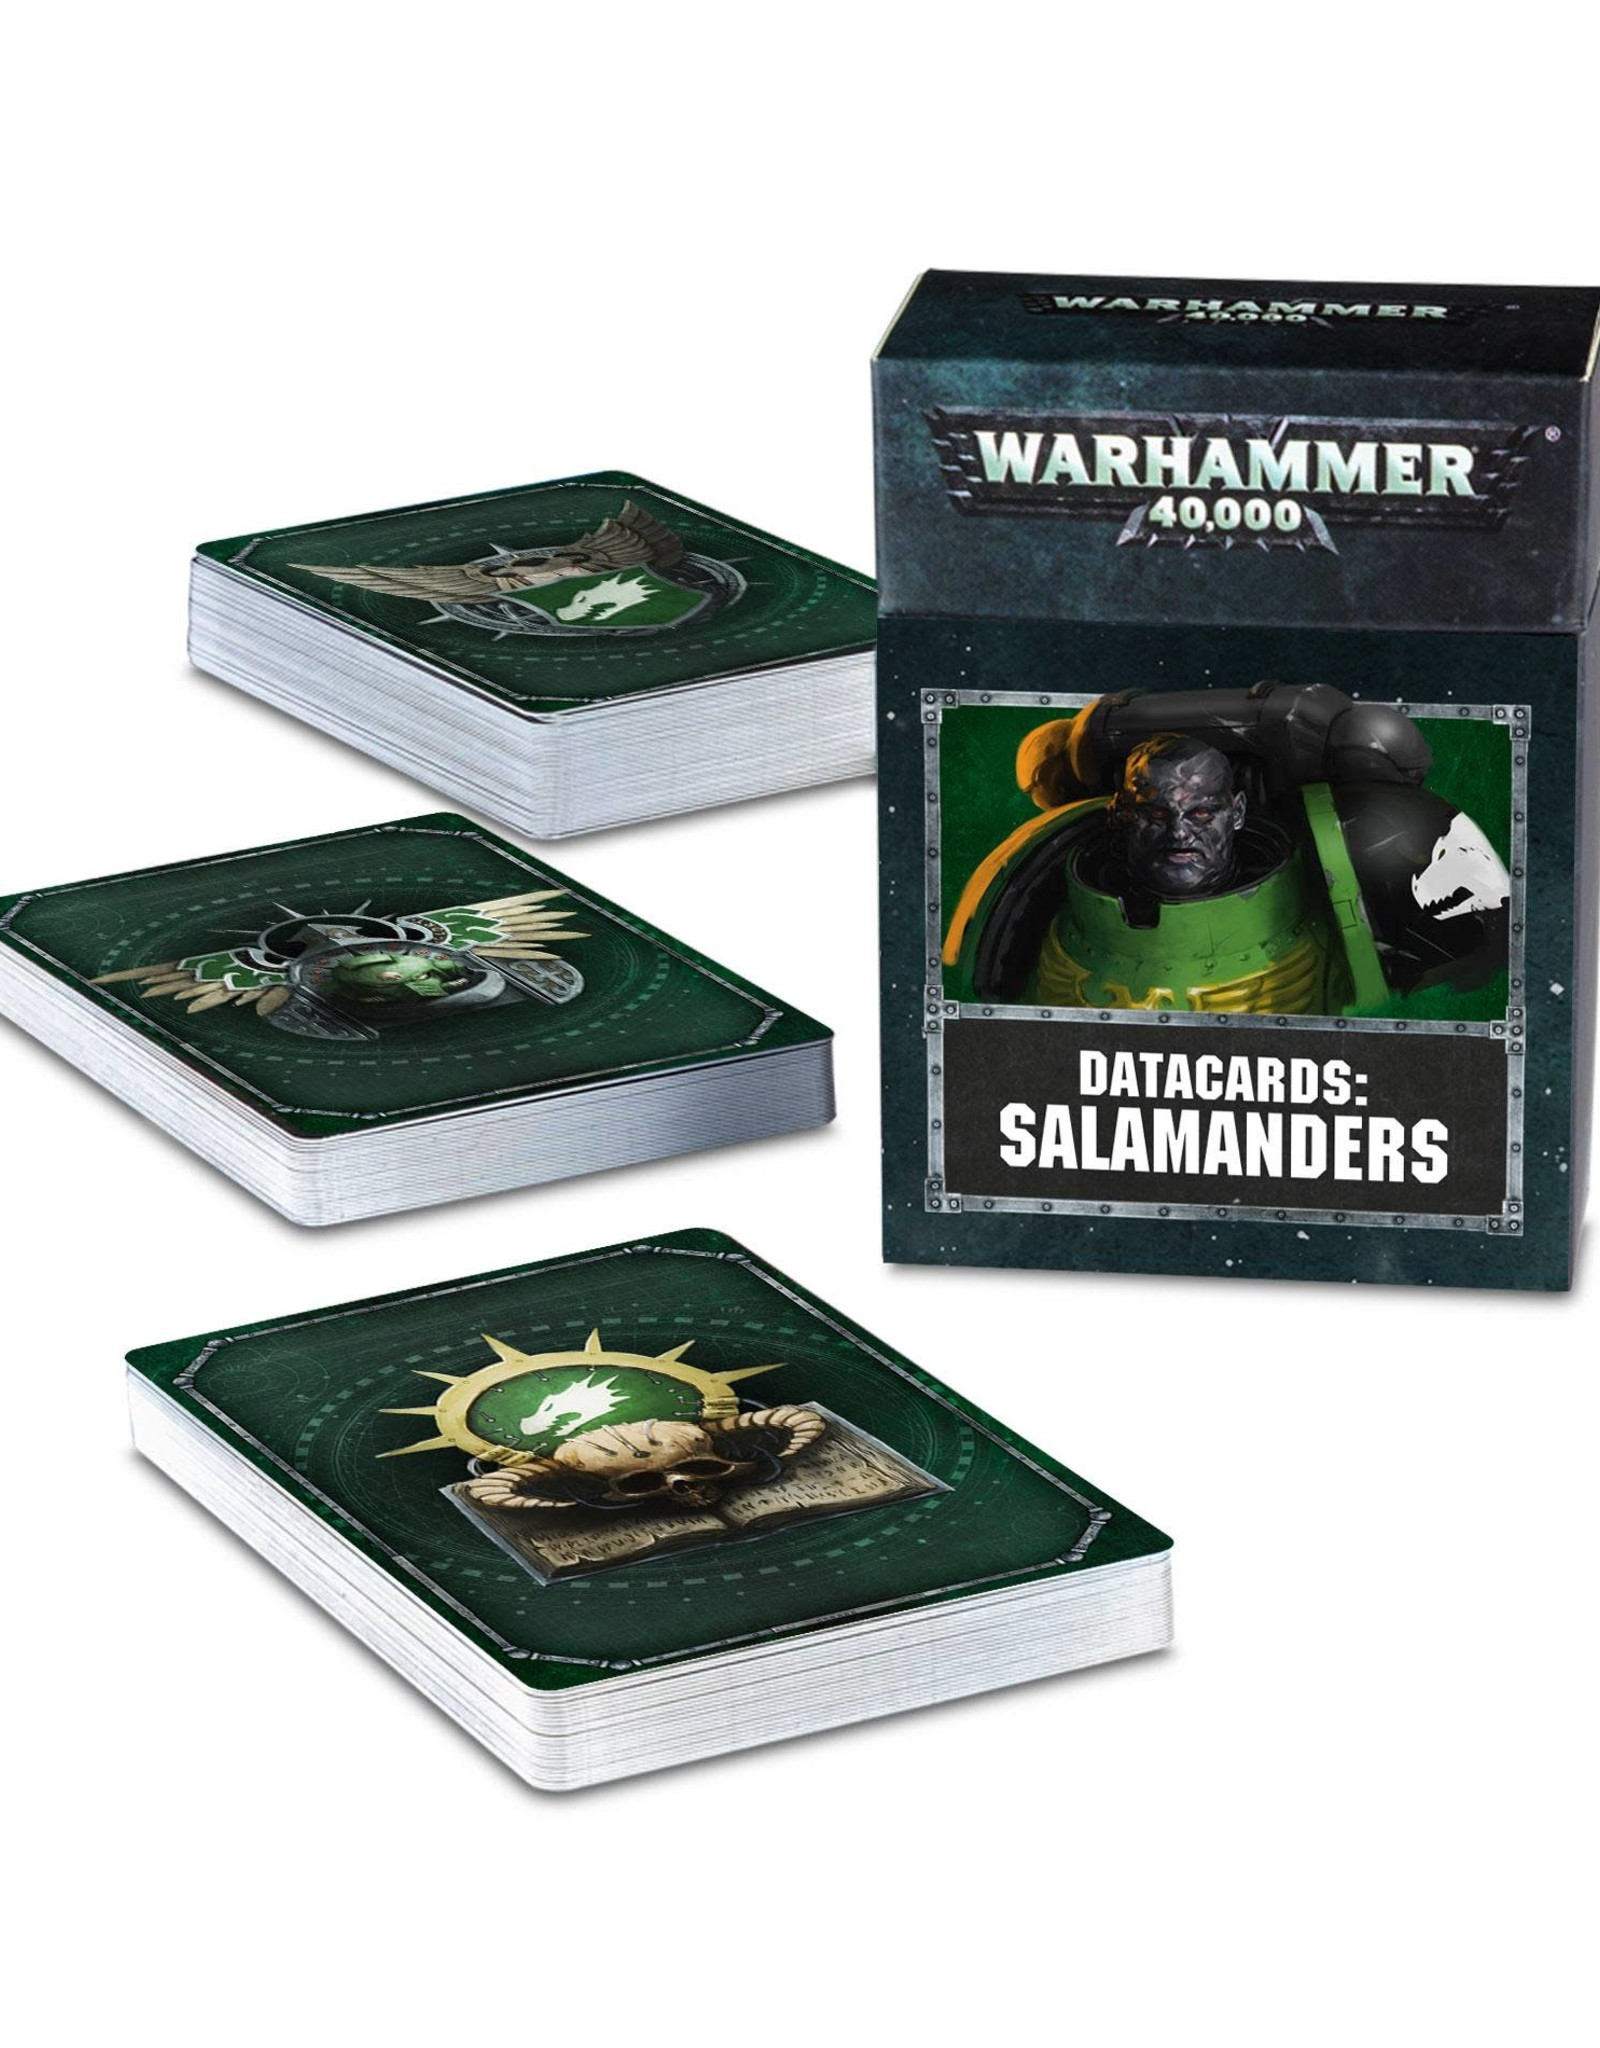 Warhammer 40K Datacards: Salamanders